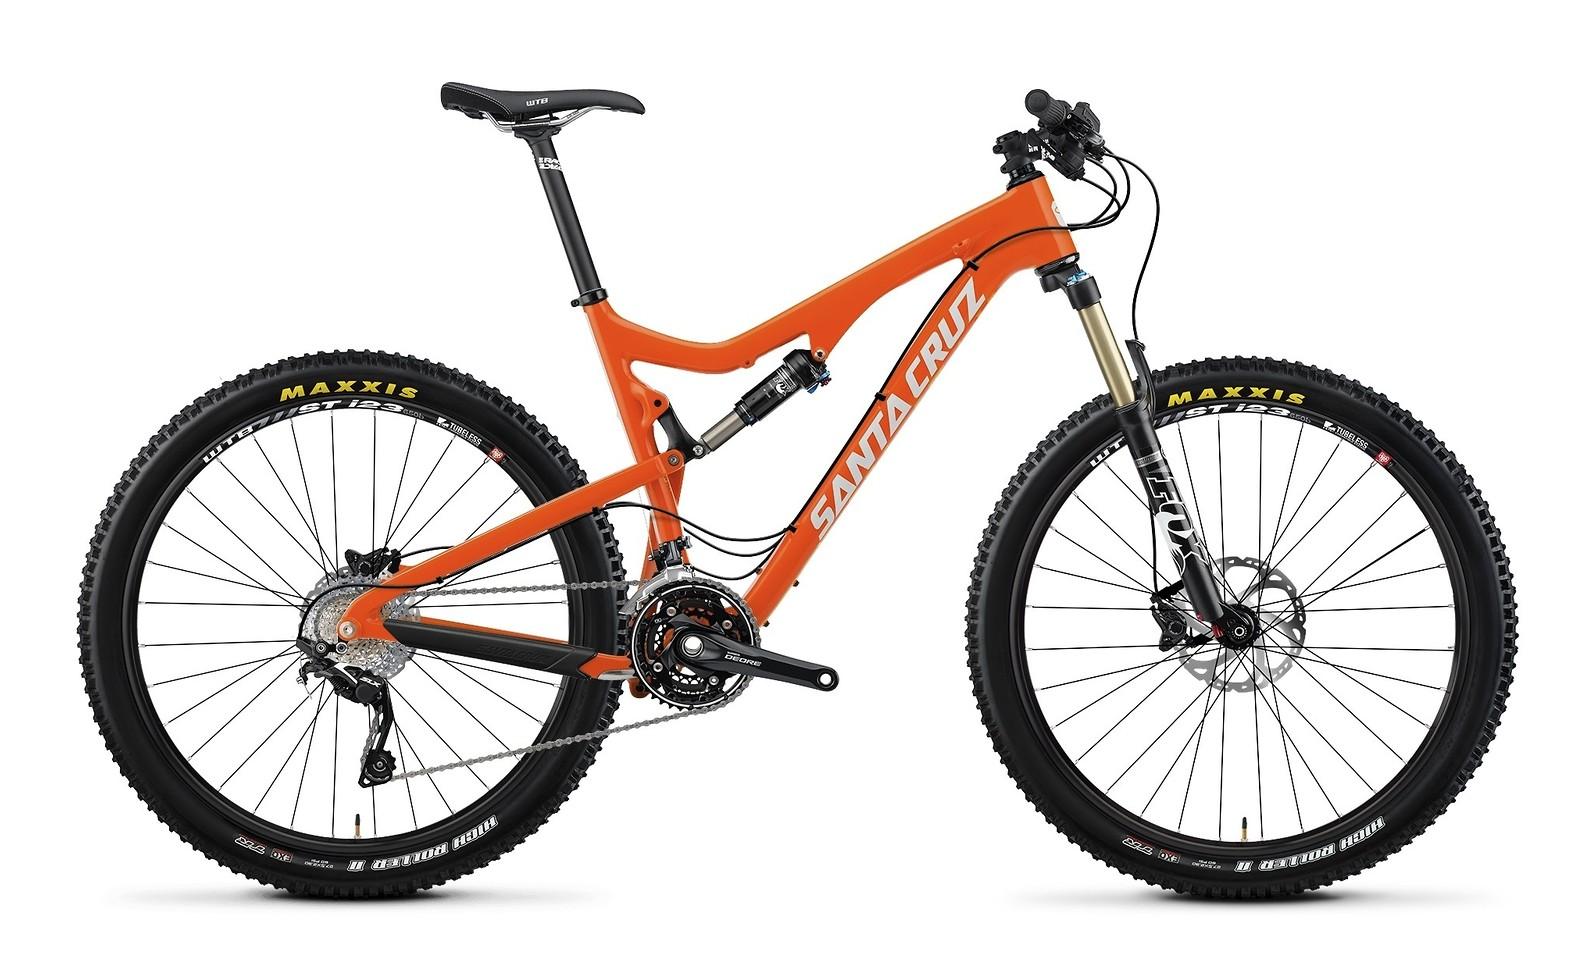 2014 Santa Cruz 5010 Carbon R AM 27.5 Bike 2014 Santa Cruz Solo Carbon R AM 27.5 Bike - orange